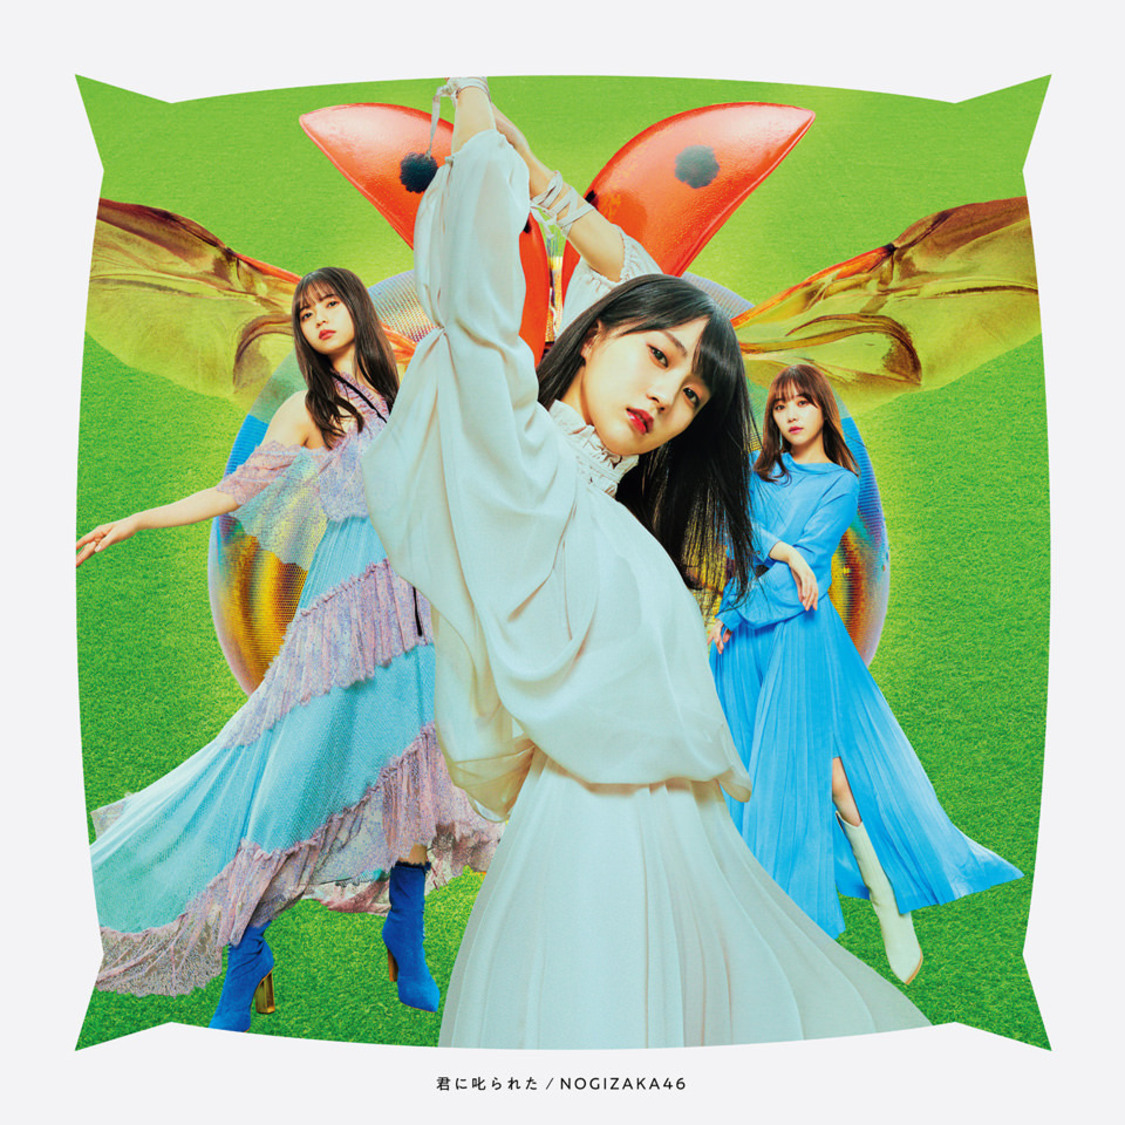 28thシングル「君に叱られた」【初回仕様限定CD+Blu-ray盤】Type-A